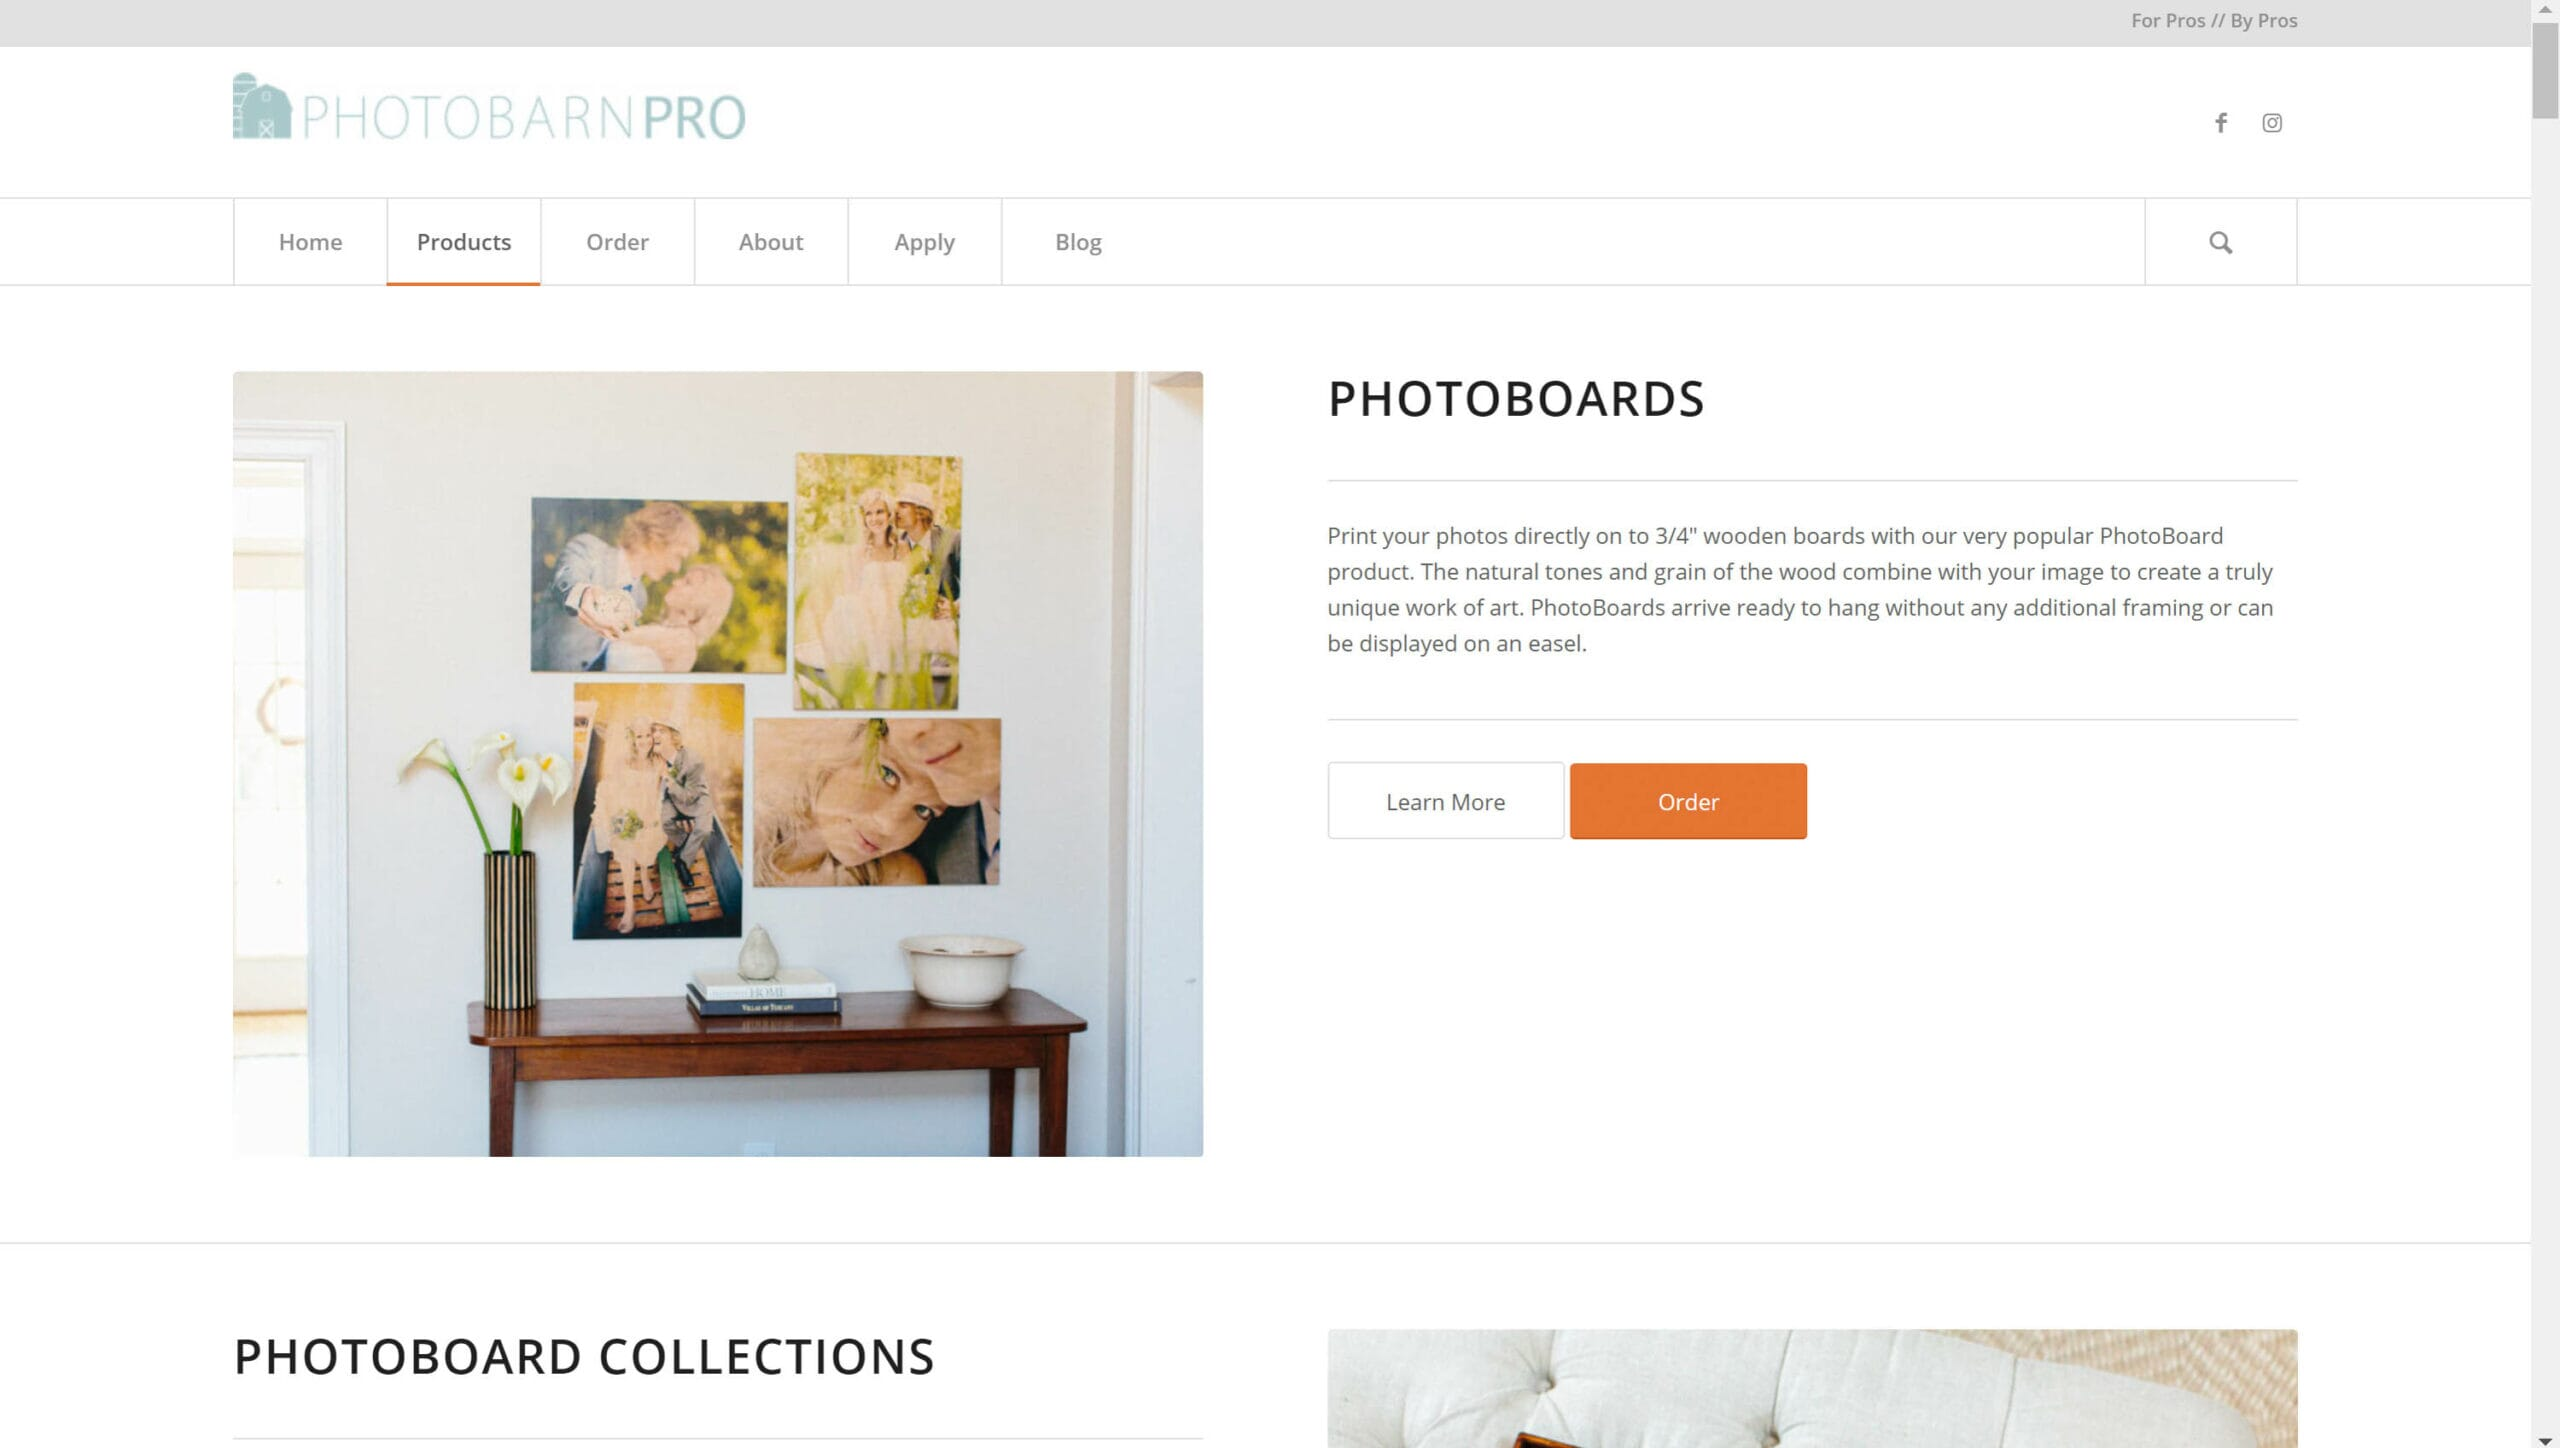 Photobarn Pro